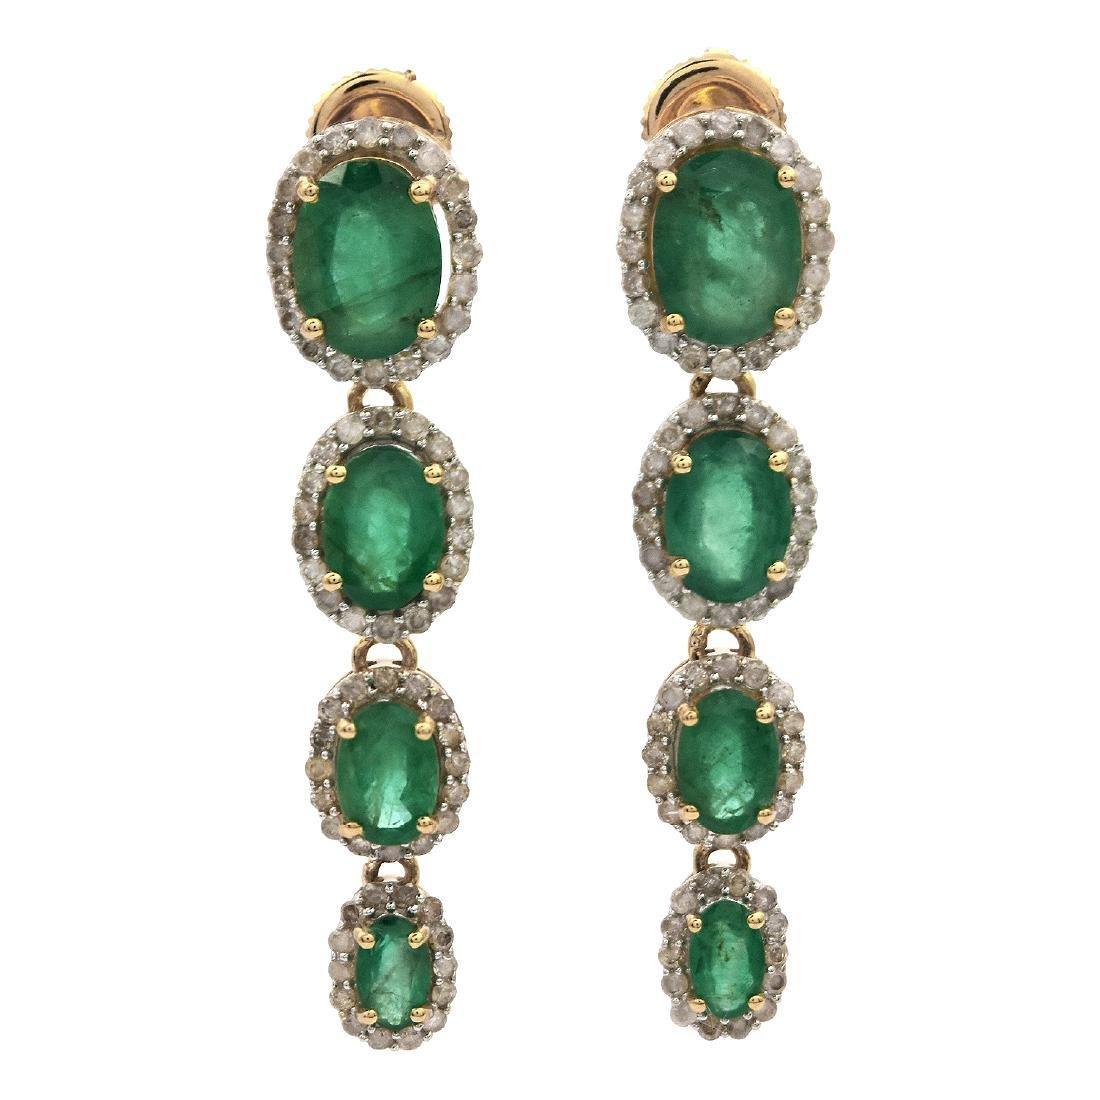 14K Gold 5.21ctw Emerald 1.0ctw Diamond Dangle Earrings